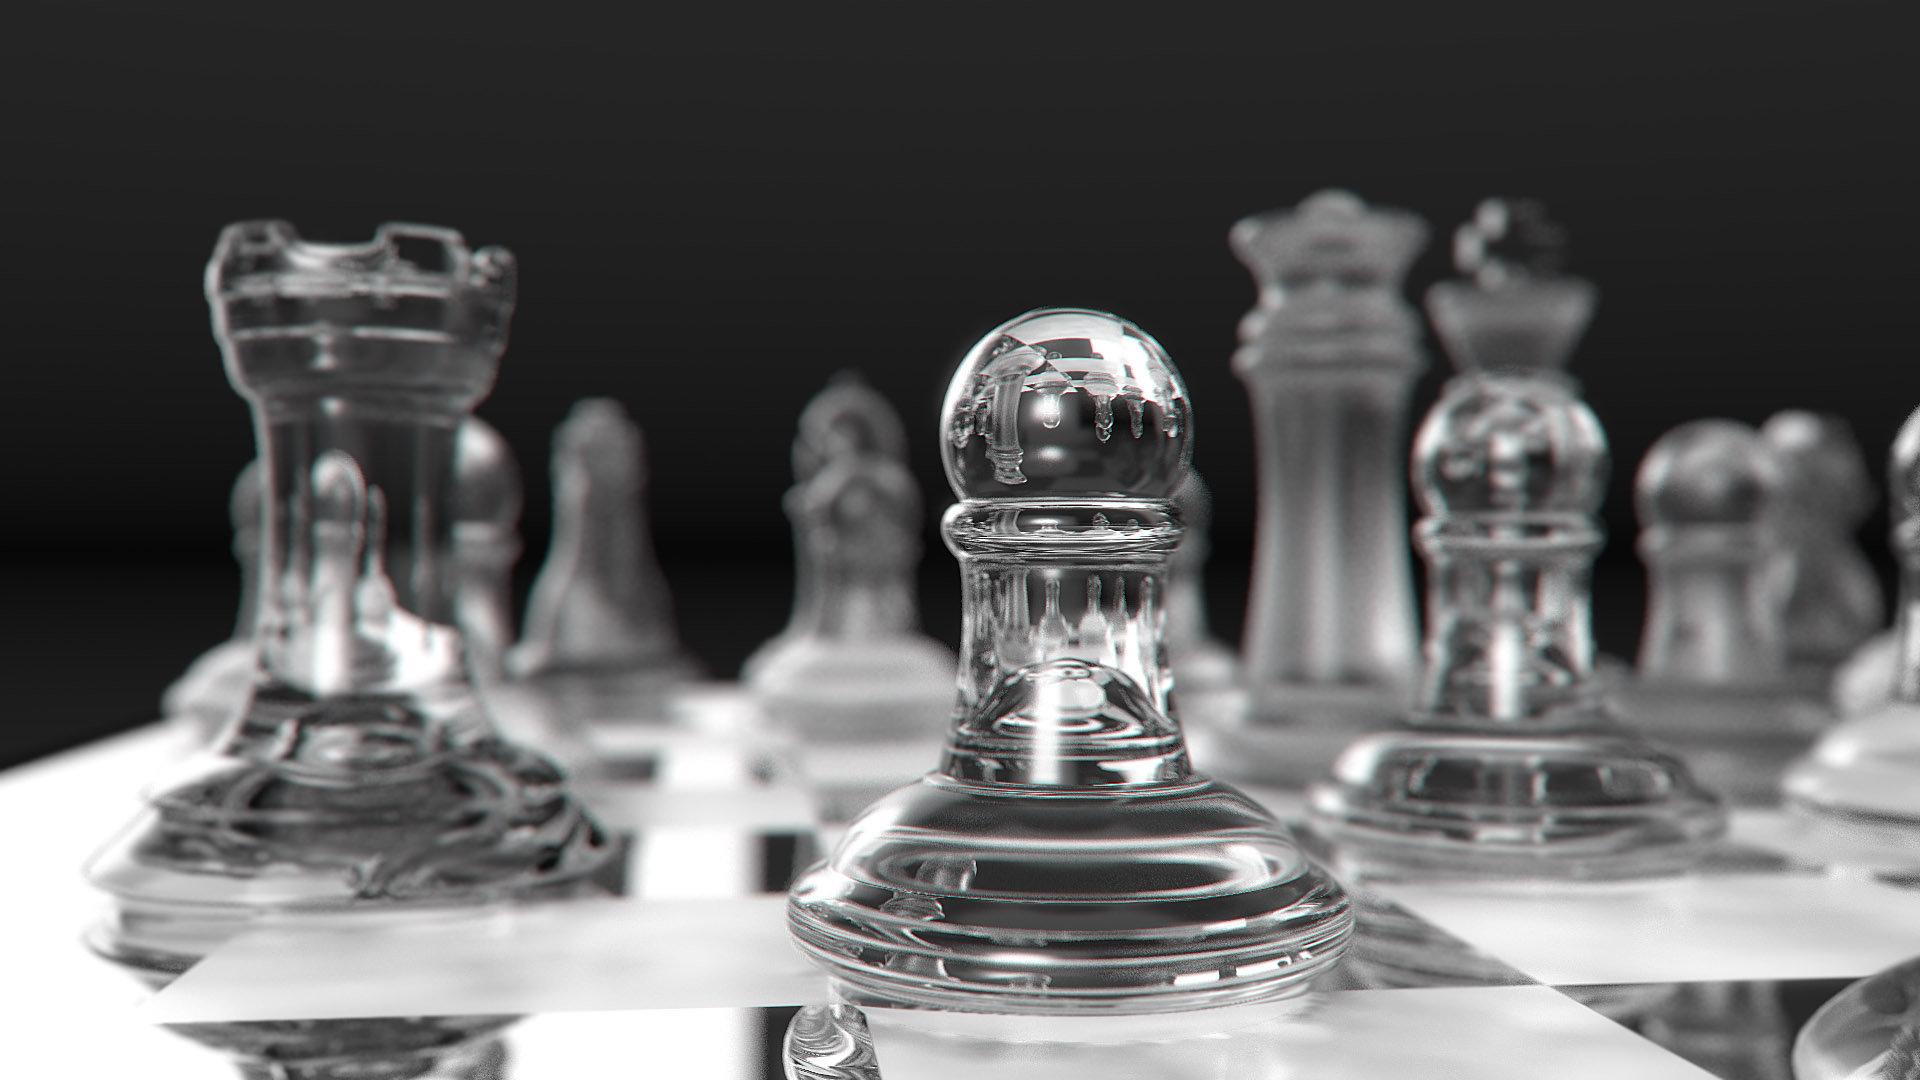 Glass Chess Set By Rockr7990 On Deviantart